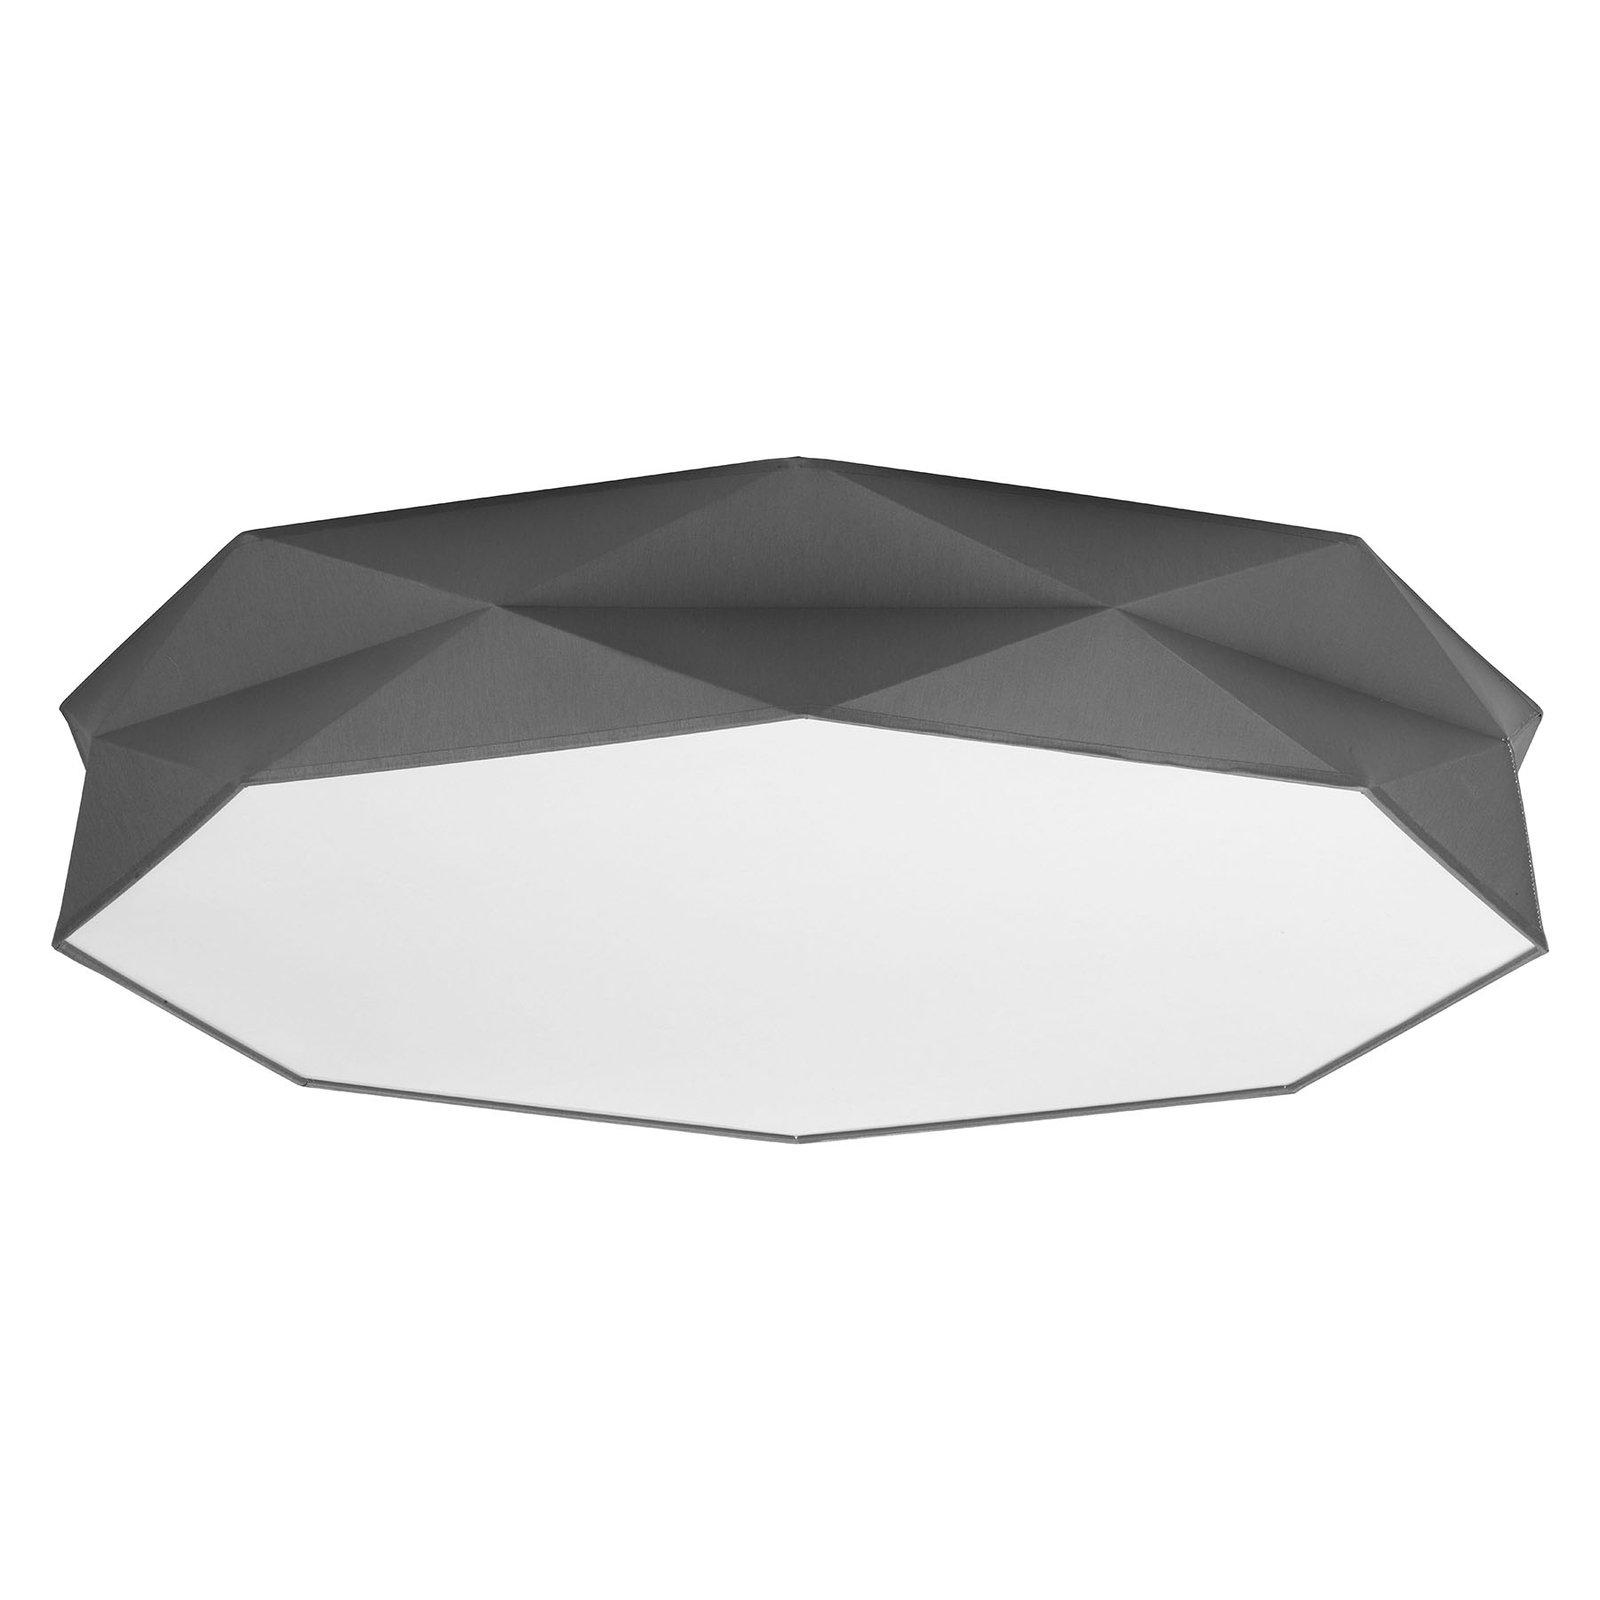 Taklampe Kantoor New, Ø 88 cm, hvit/grå